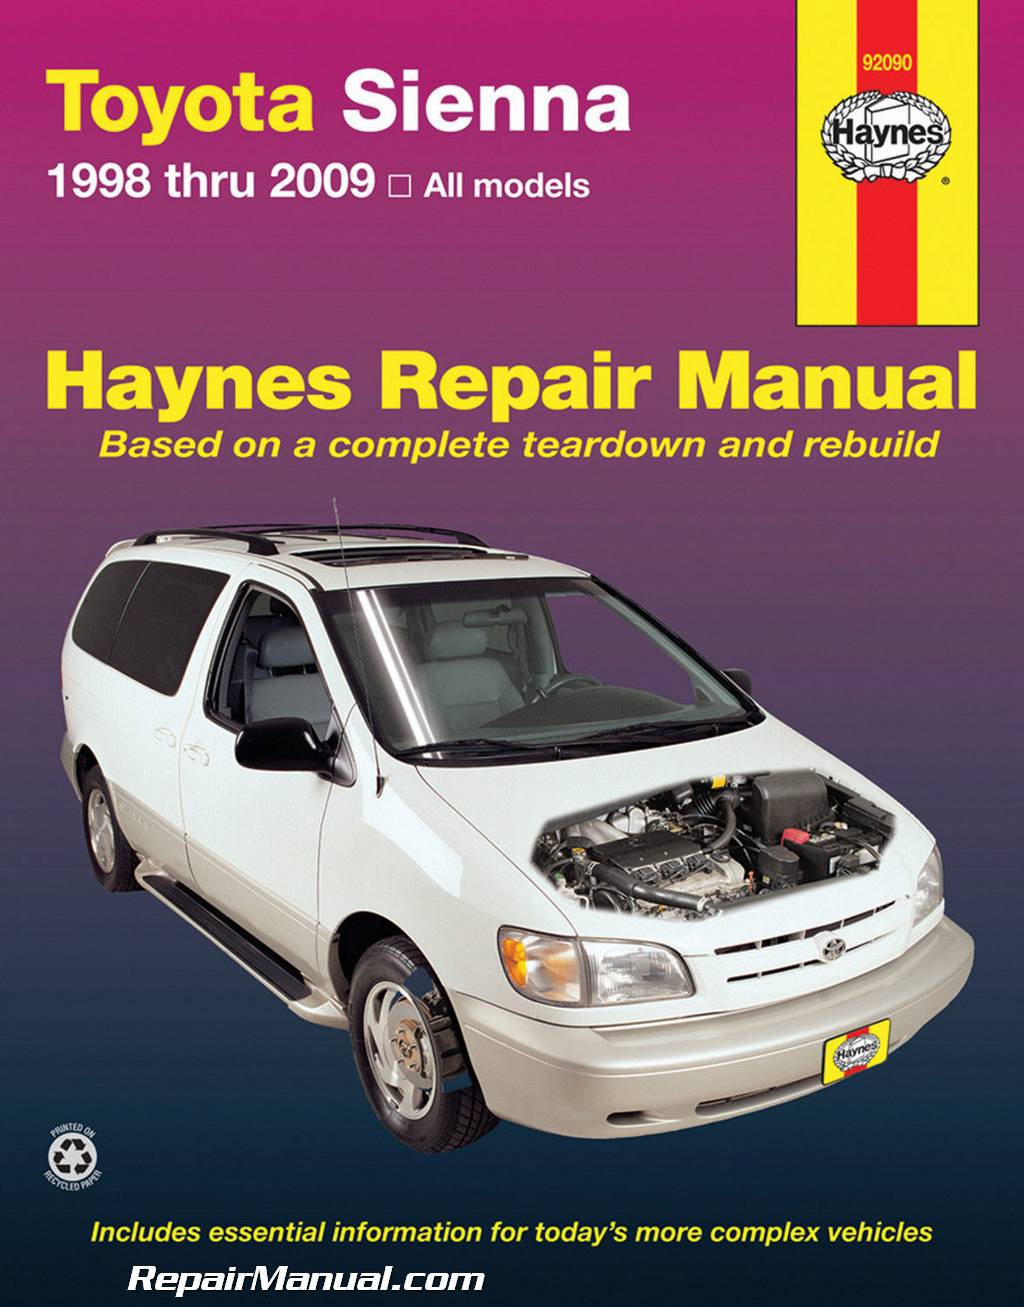 Haynes Toyota Sienna 1998